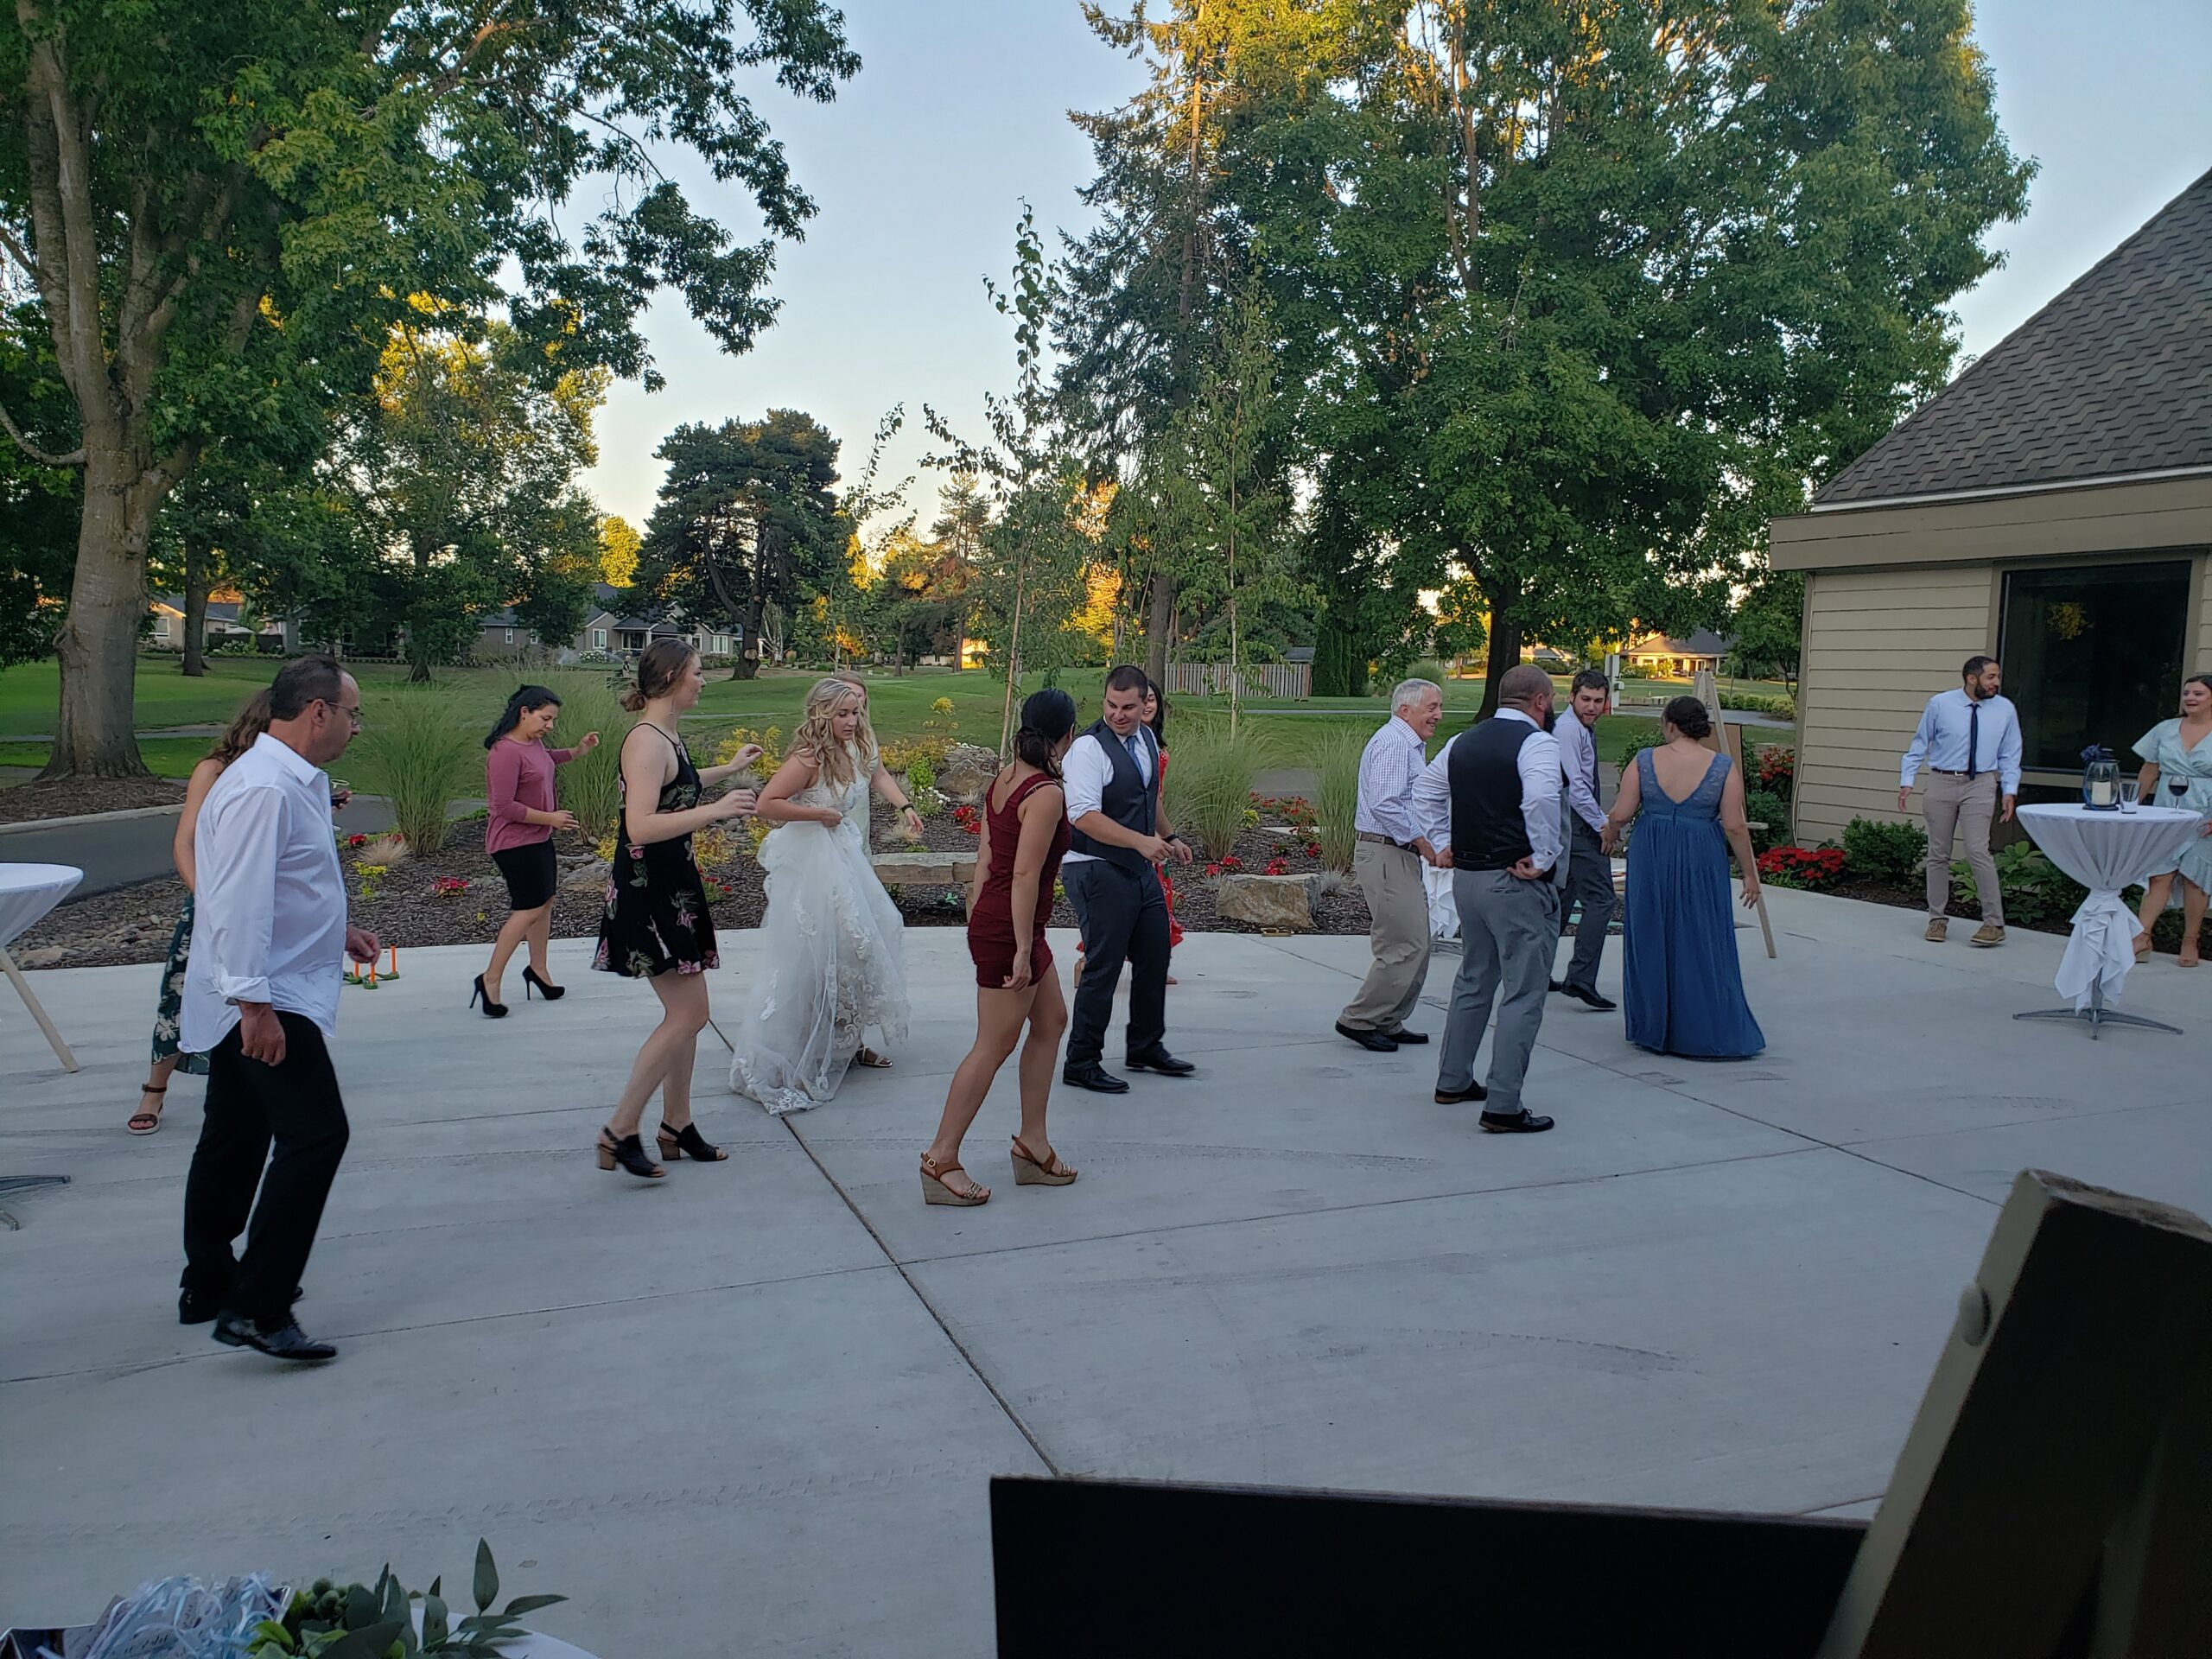 Charbonneau Country Club Wilsonville Wedding (7-24-2021)